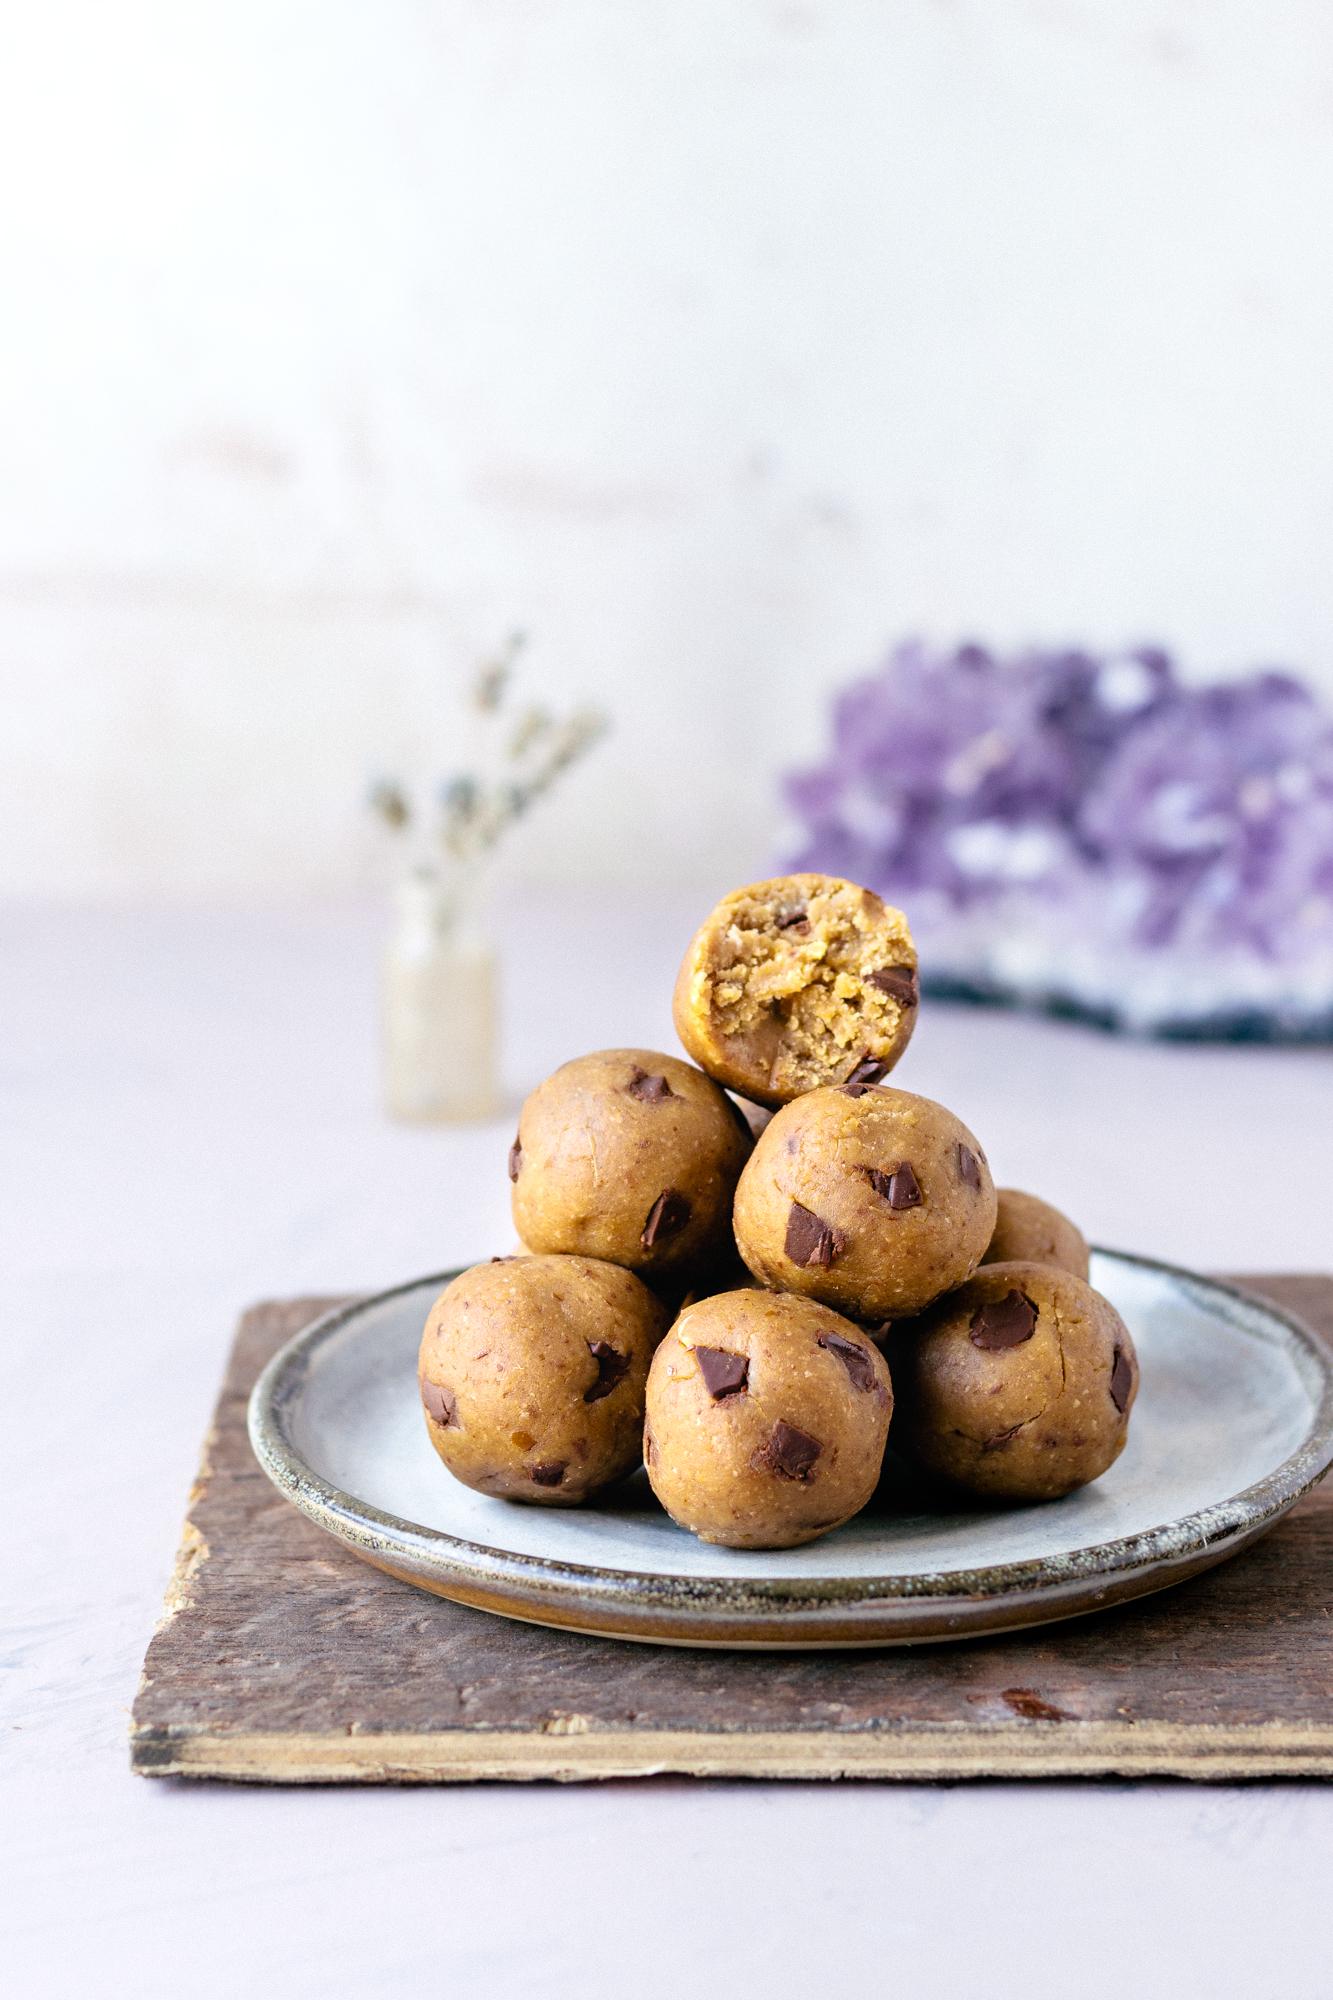 Vegan Peanut Butter Cookie Dough Protein Balls